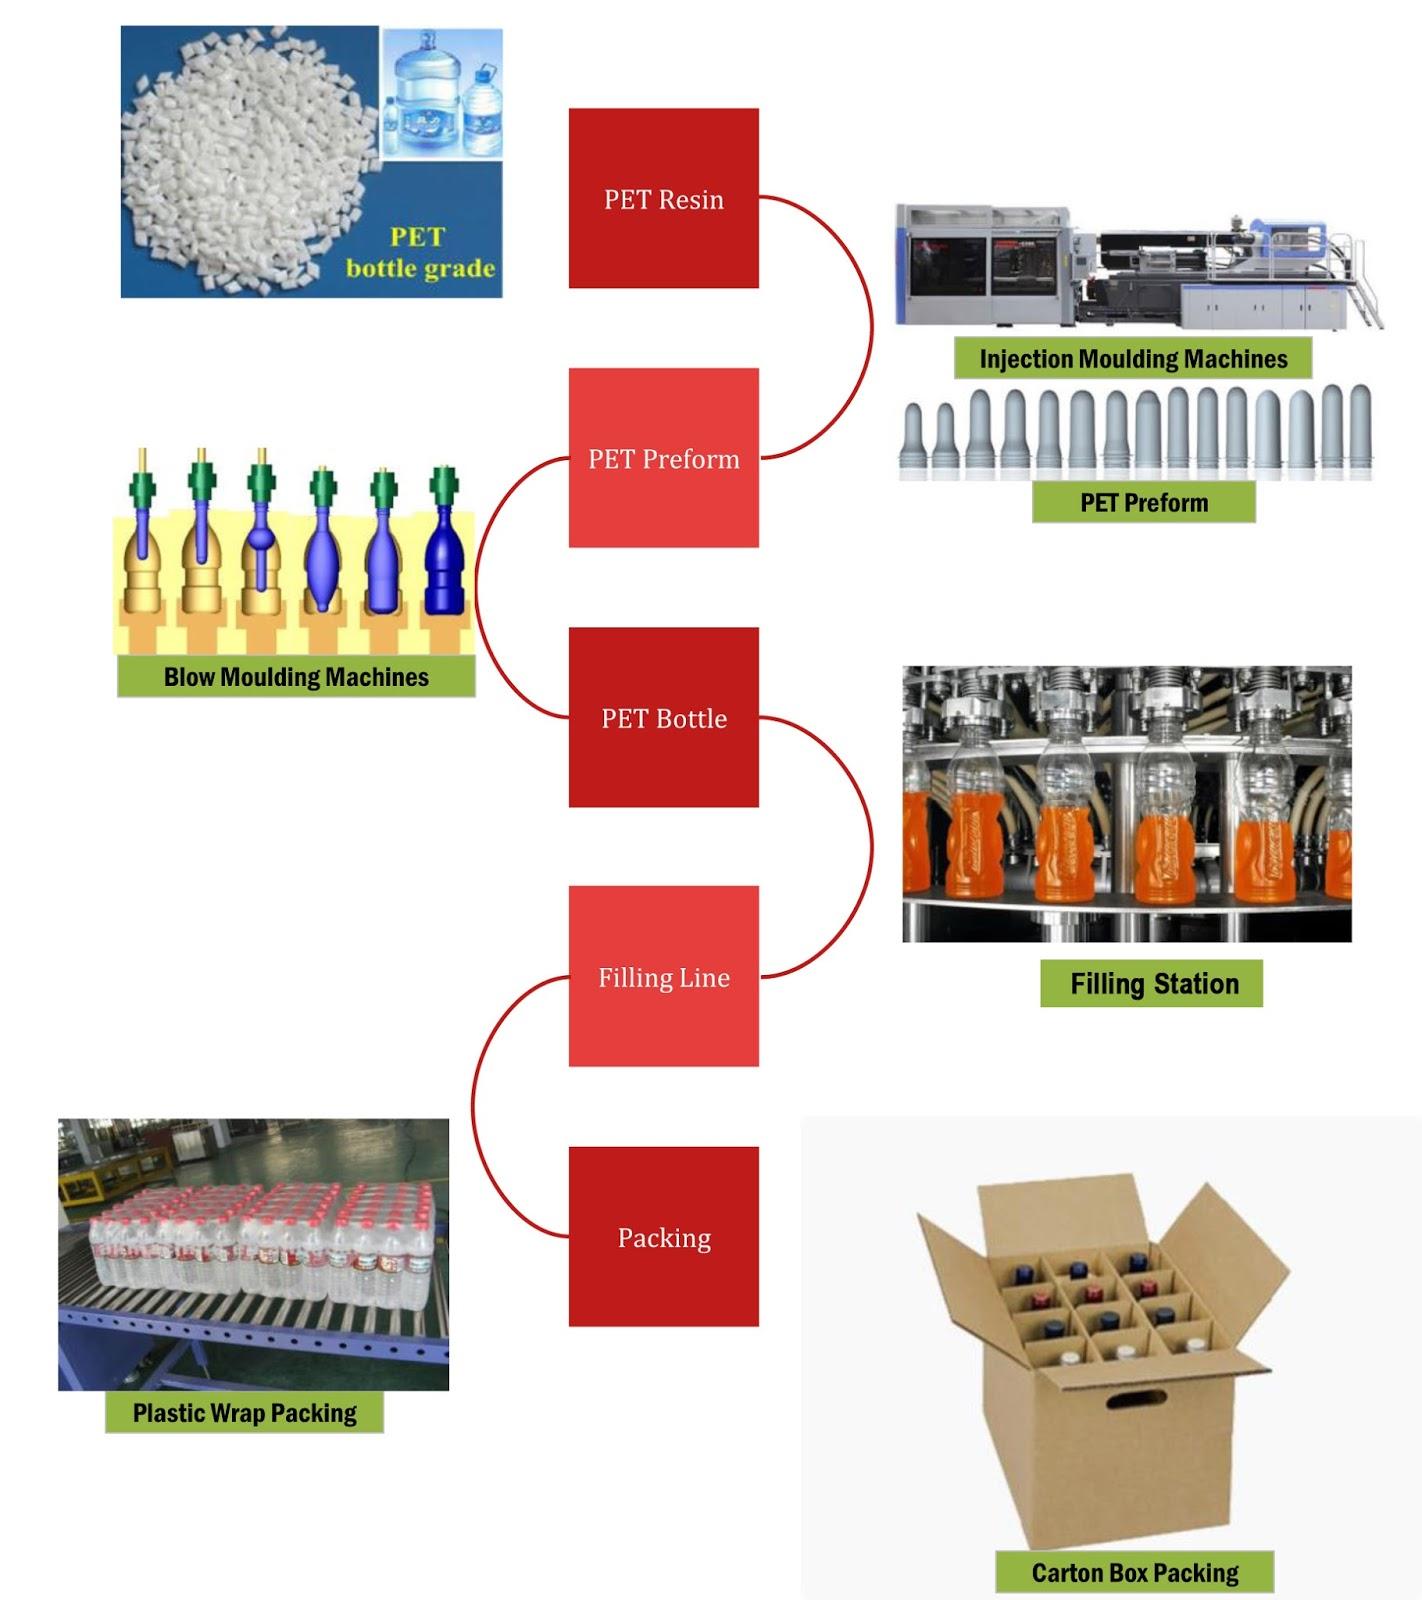 Kemenperin: Industri Daur Ulang Jadikan Limbah Plastik Punya Nilai Tambah